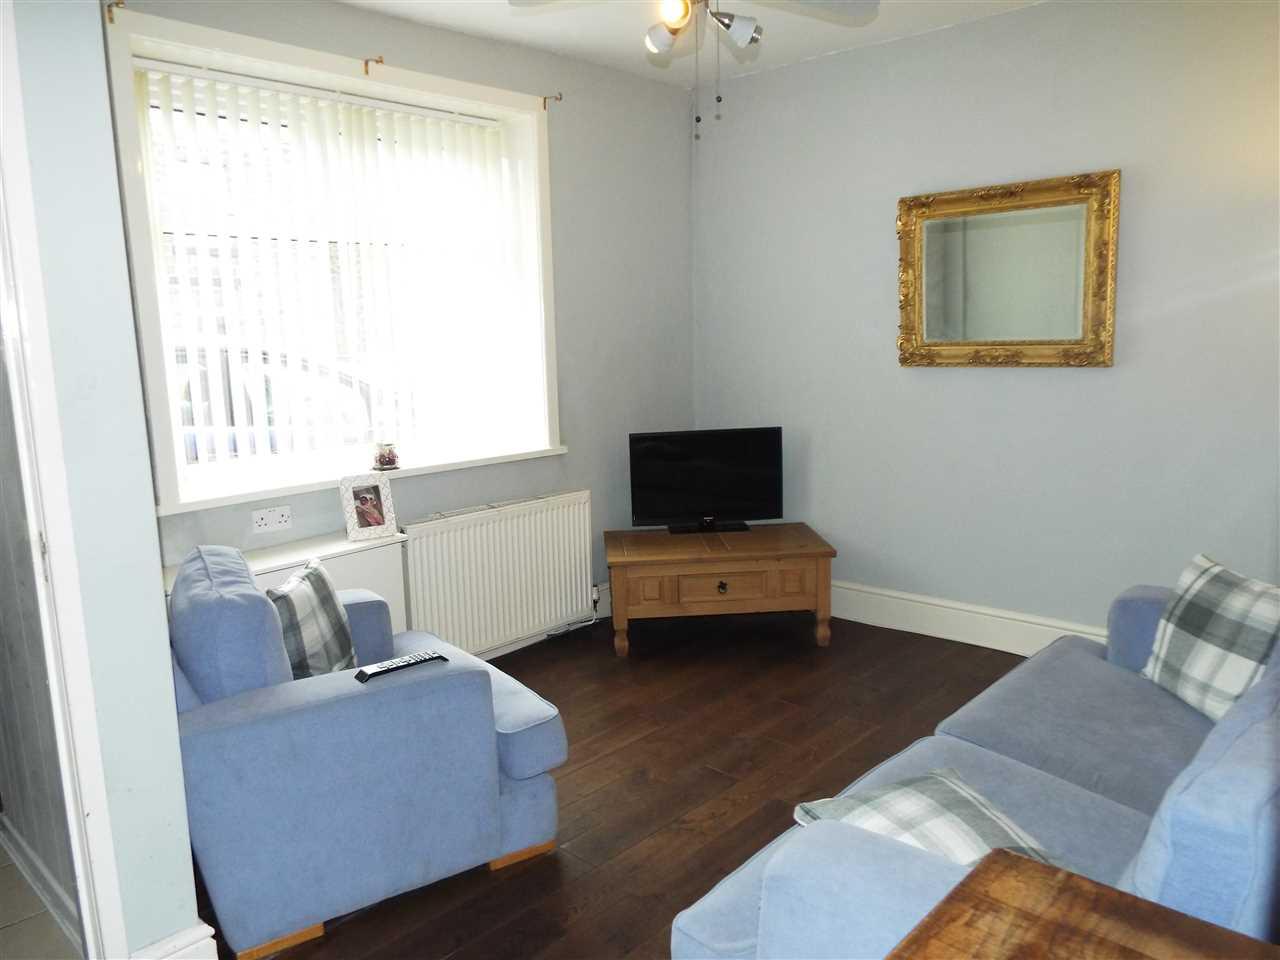 3 bed end-of-terrace for sale in Park Road, Adlington, Adlington 4